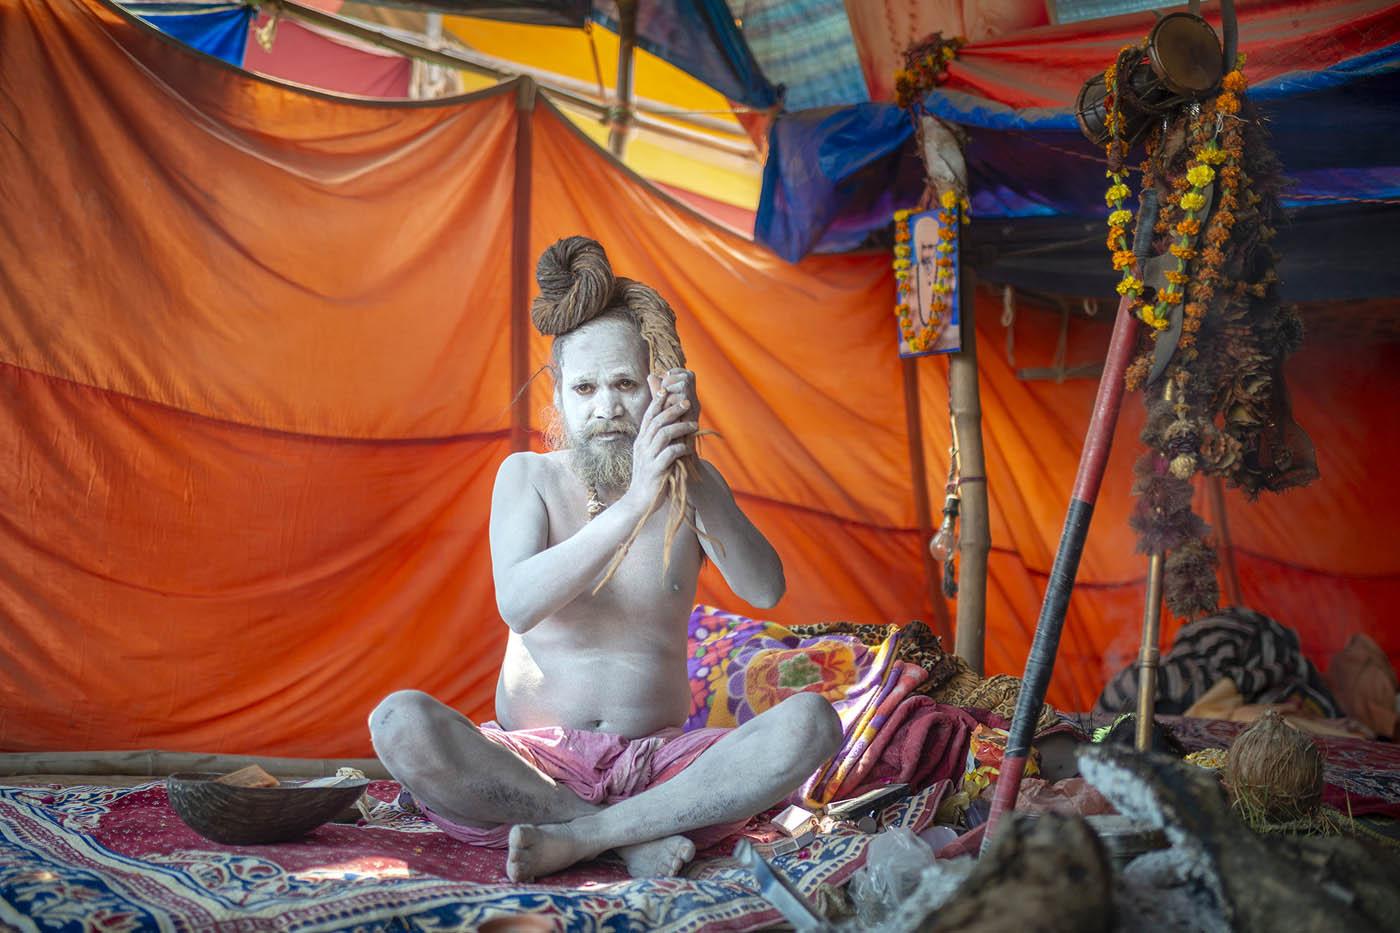 travel photography india kumbh mela by saravanan dhandapani